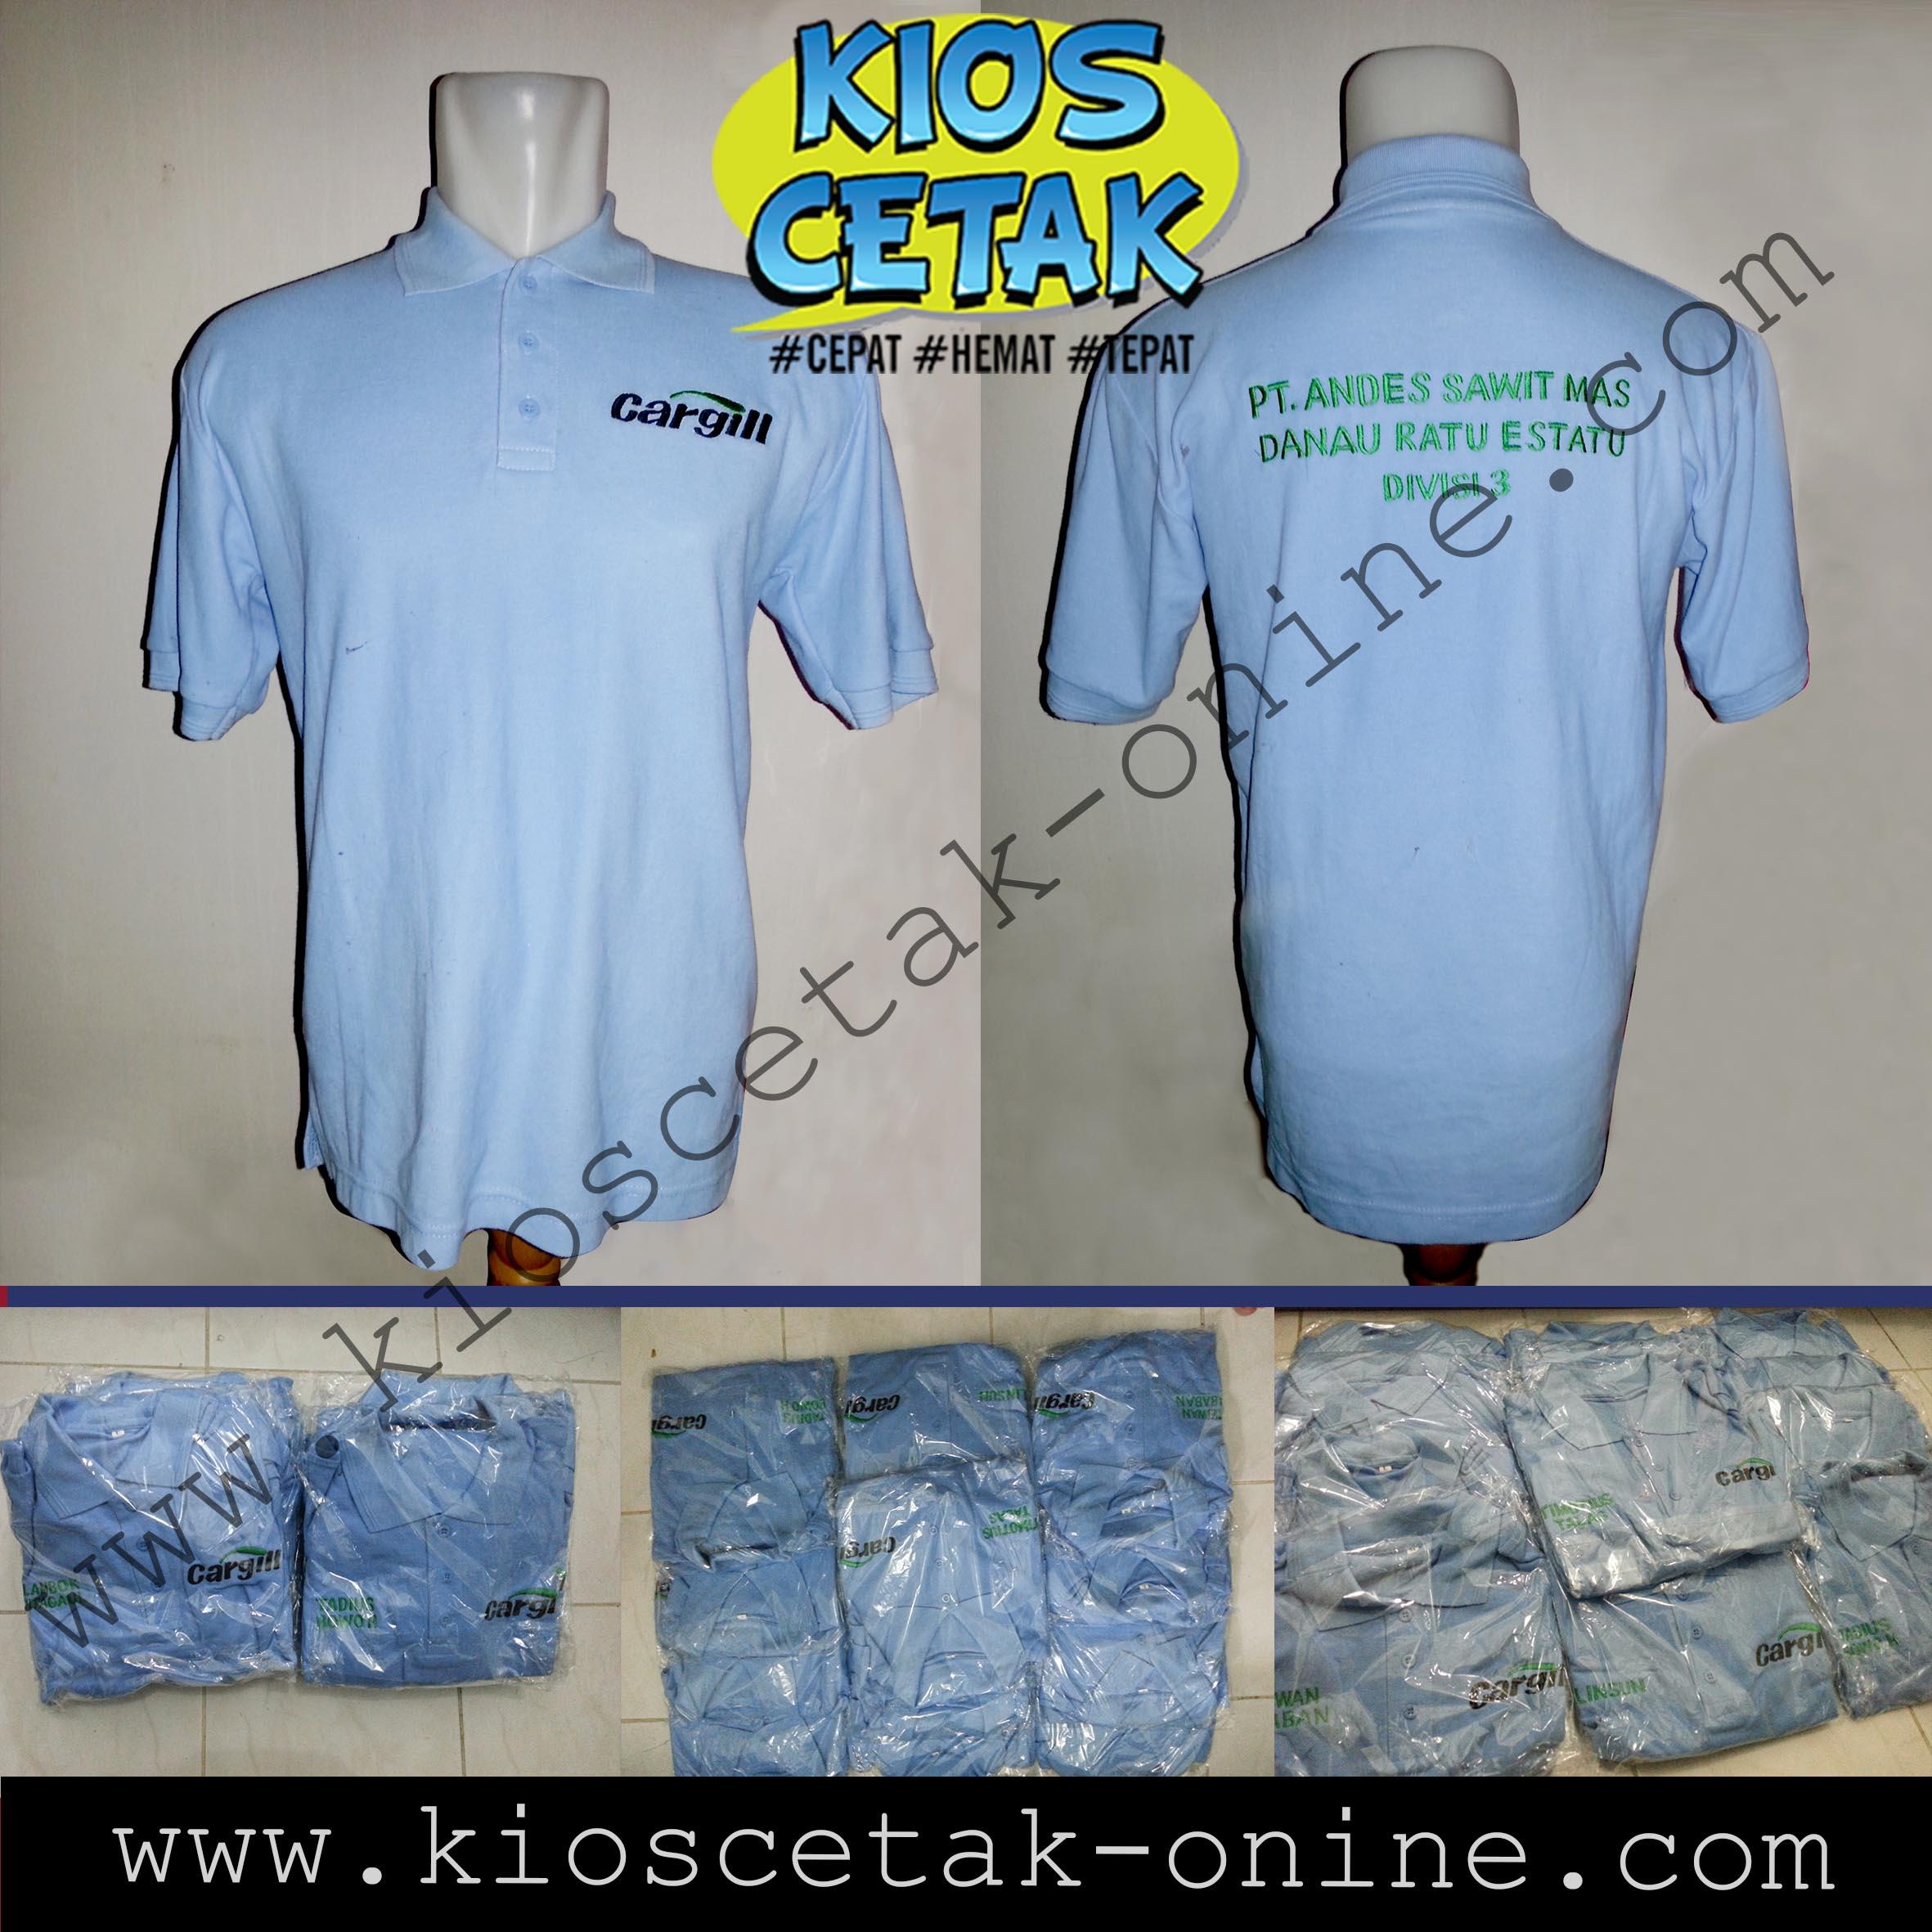 Cargill Polo shirt